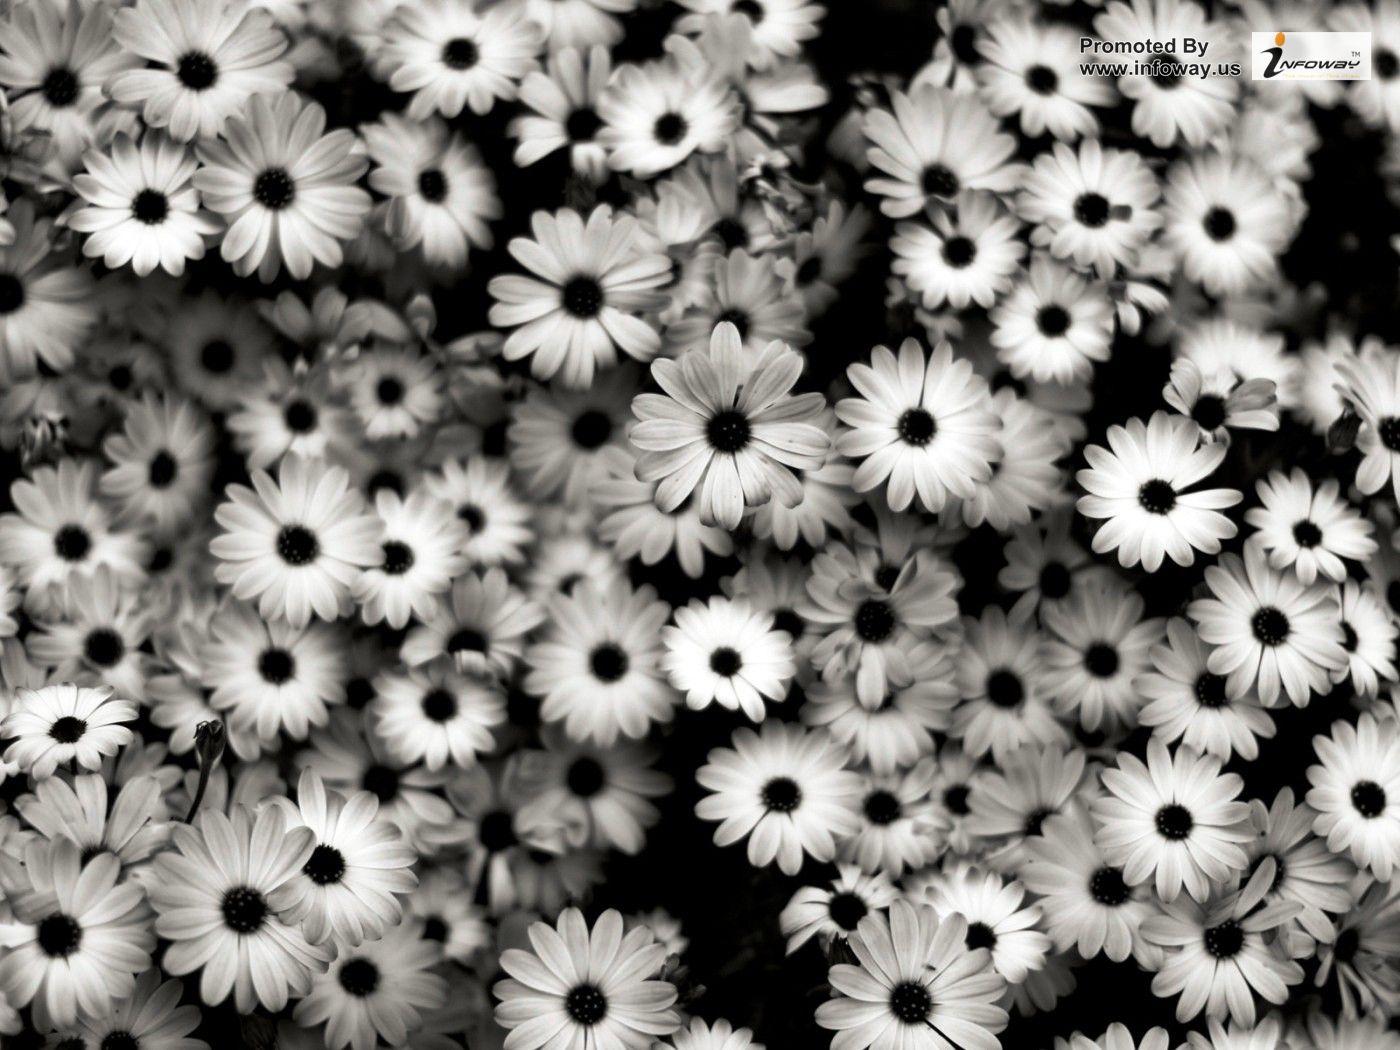 Black And White Flowers Wallpaper 19 Cool Wallpaper HdFlowerWallpaper